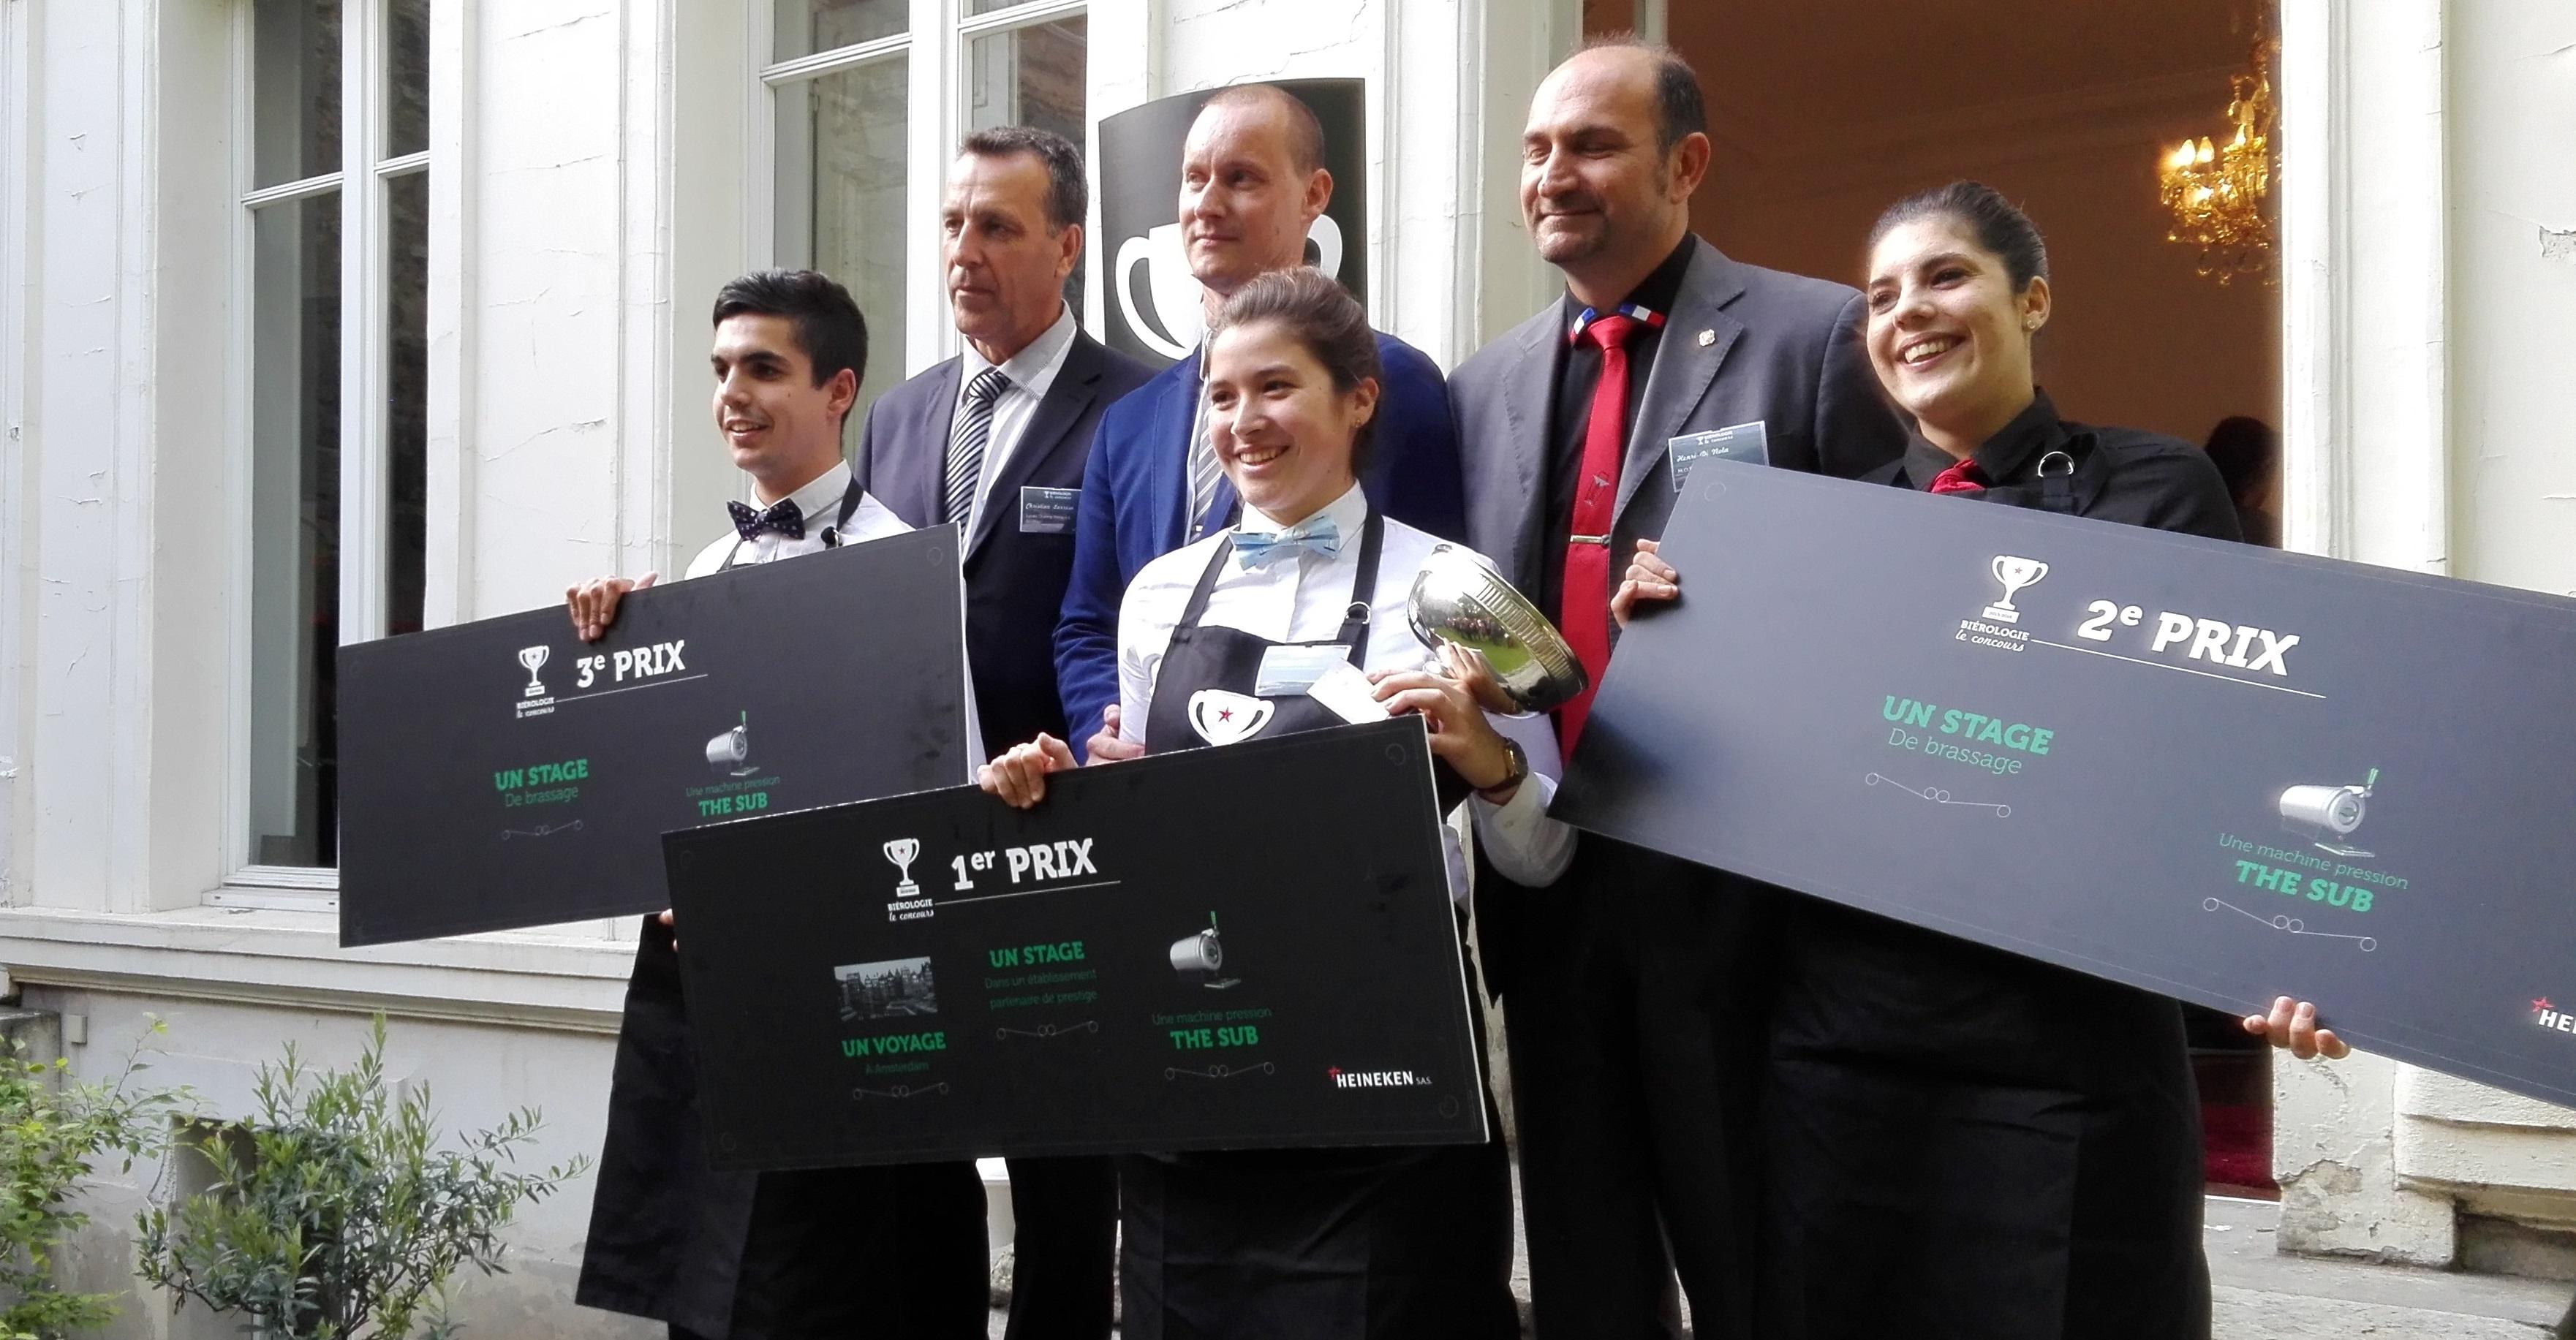 Finale du concours de biérologie 2016 Heineken